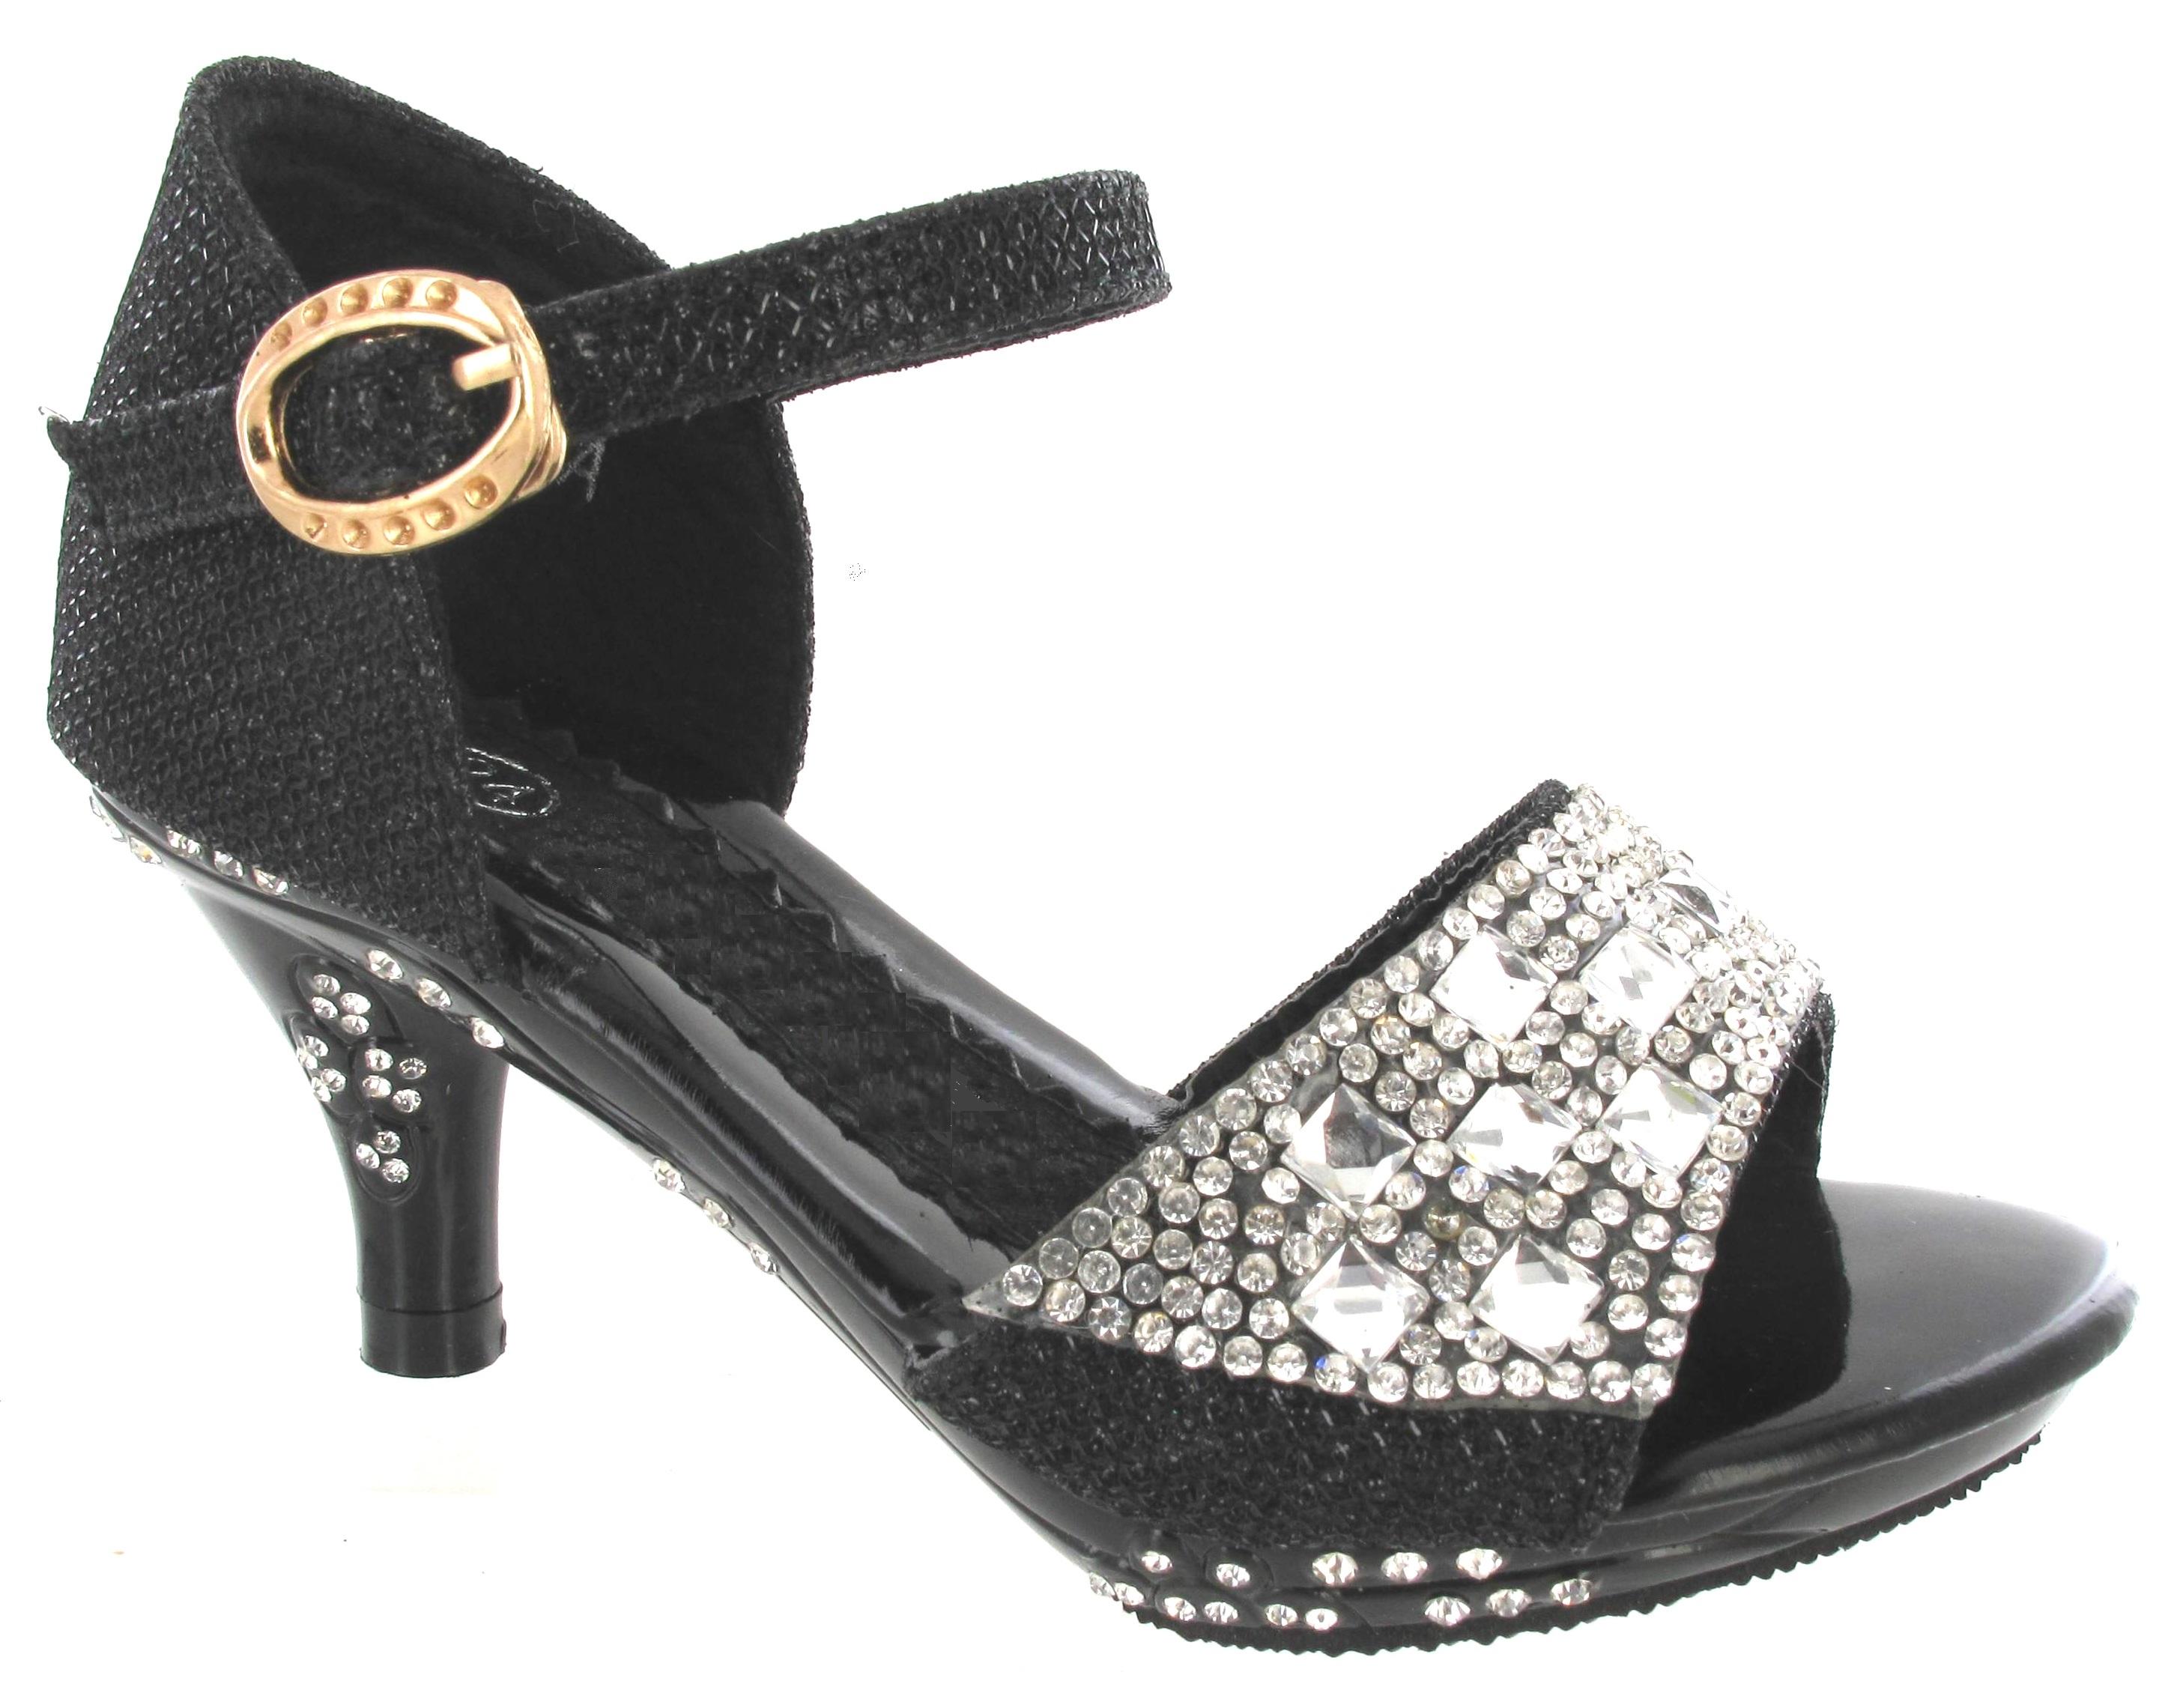 new girls mid high heel wedding party birdesmaid diamante